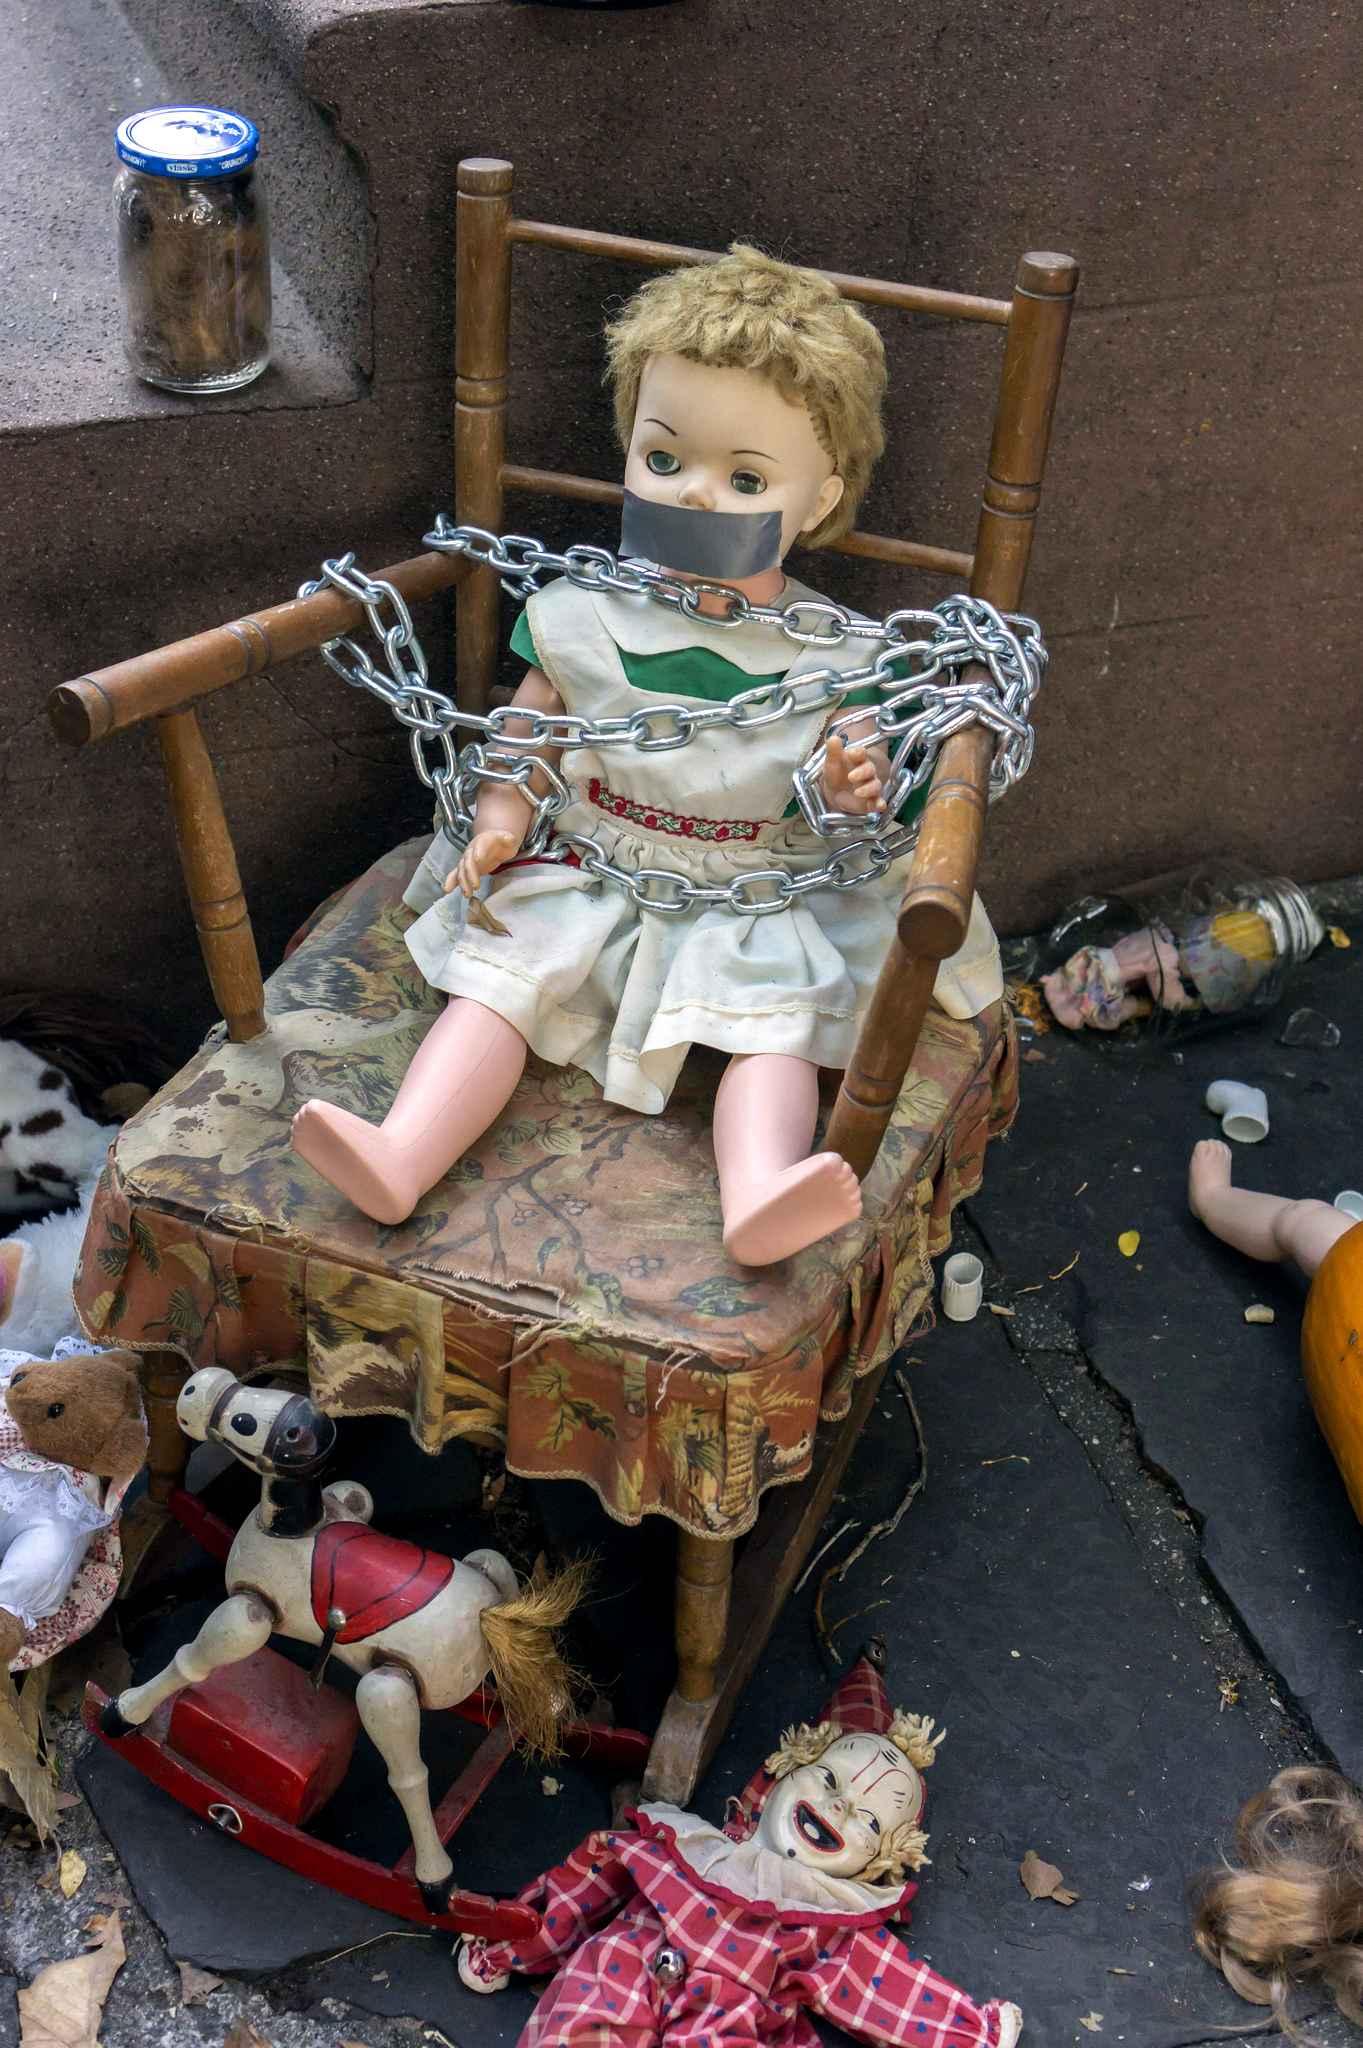 gruesome-halloween-display-is-4907-diaporama